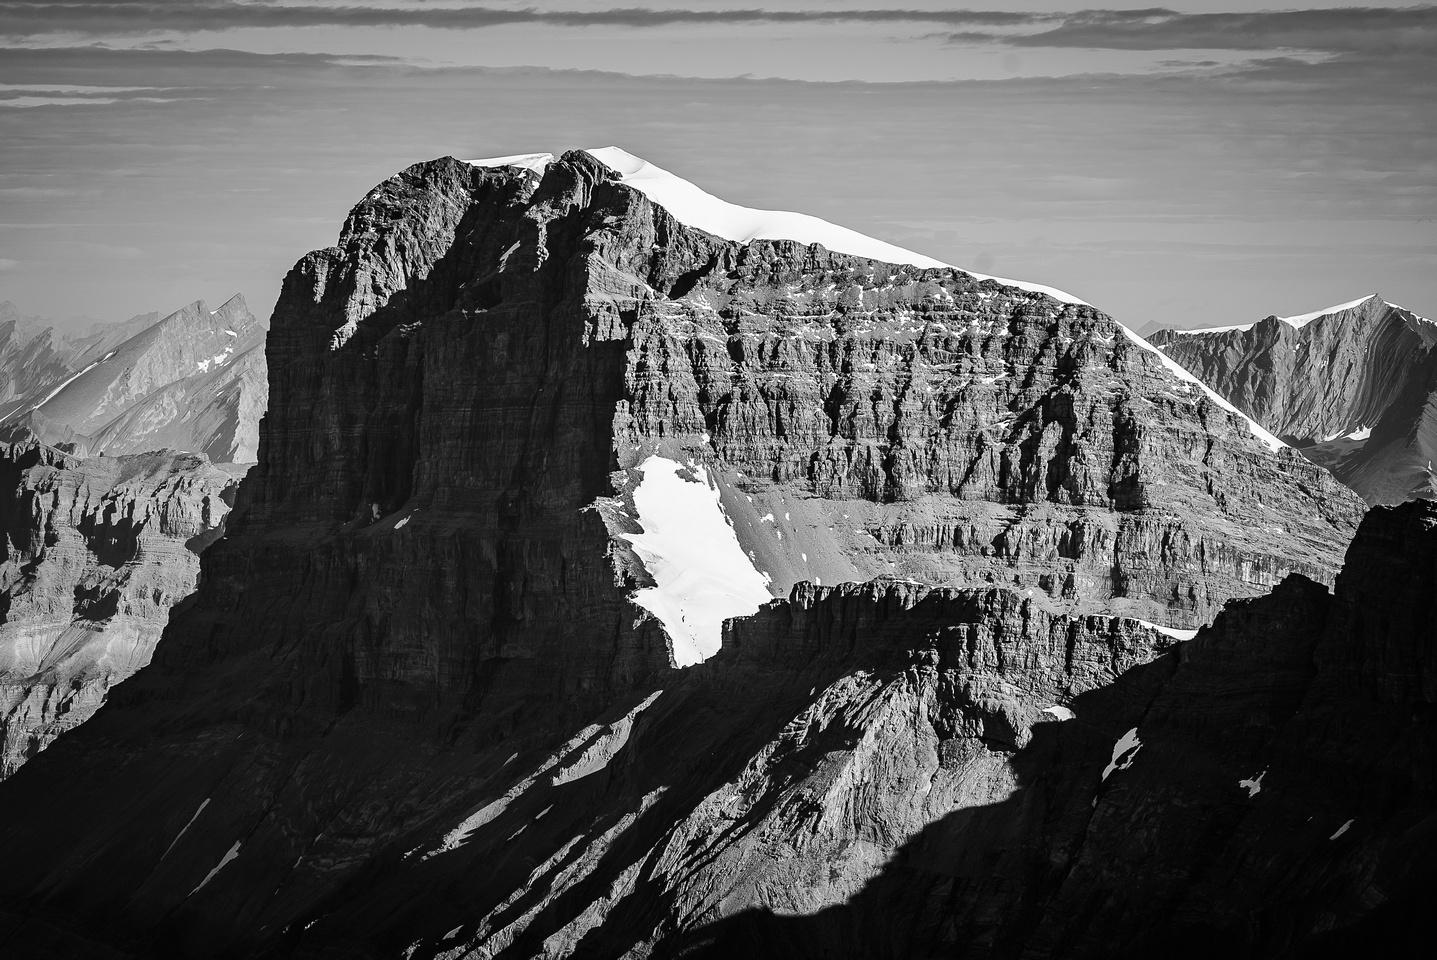 The impressive west face of Mount Warren.